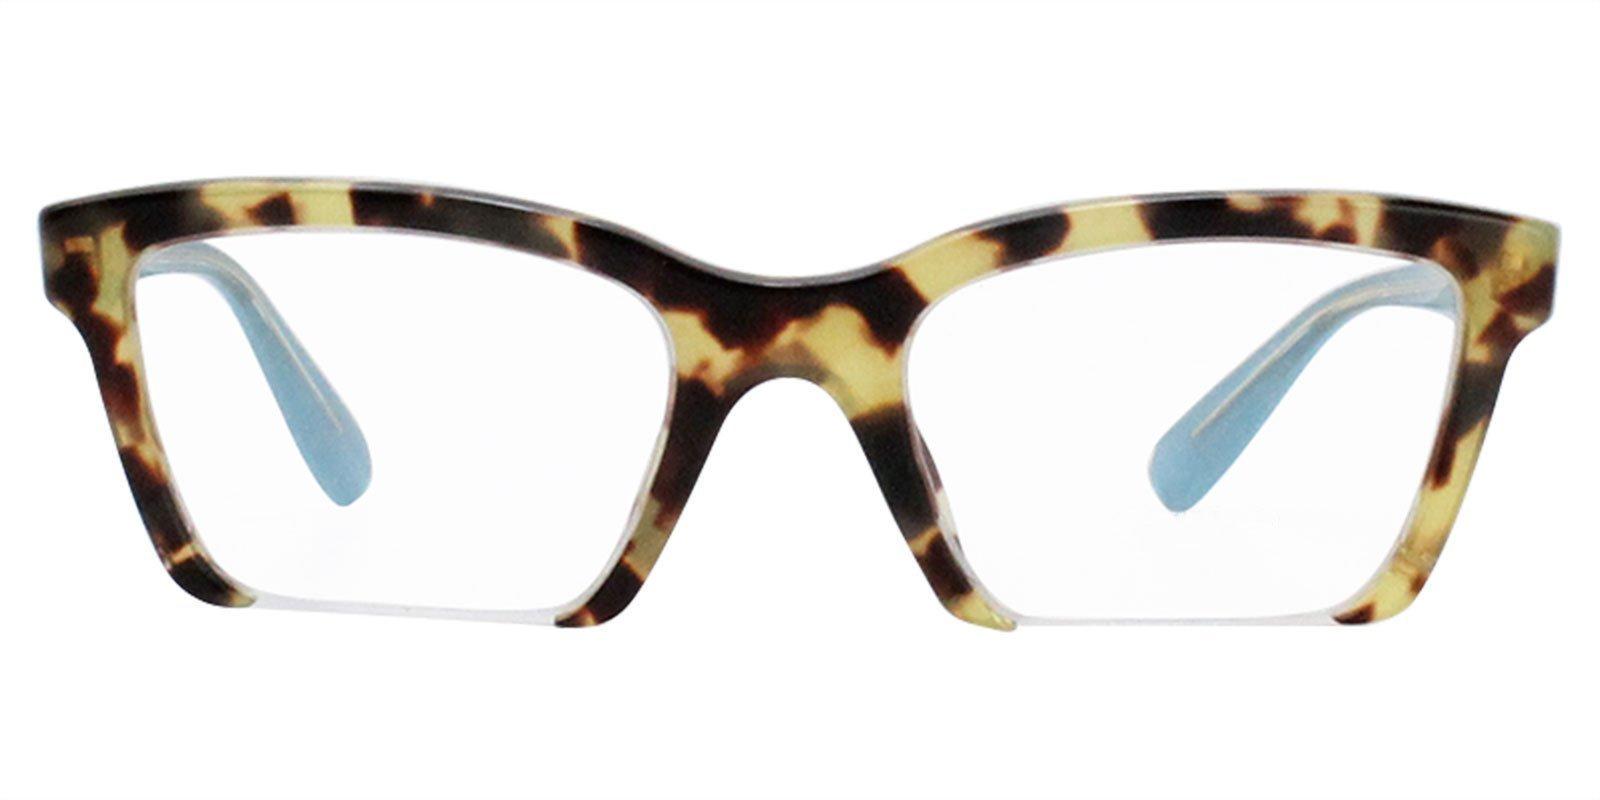 miu-miu-eyeglasses-miu-miu-mu04nv-tortoise-designer-eyes-8053672274240